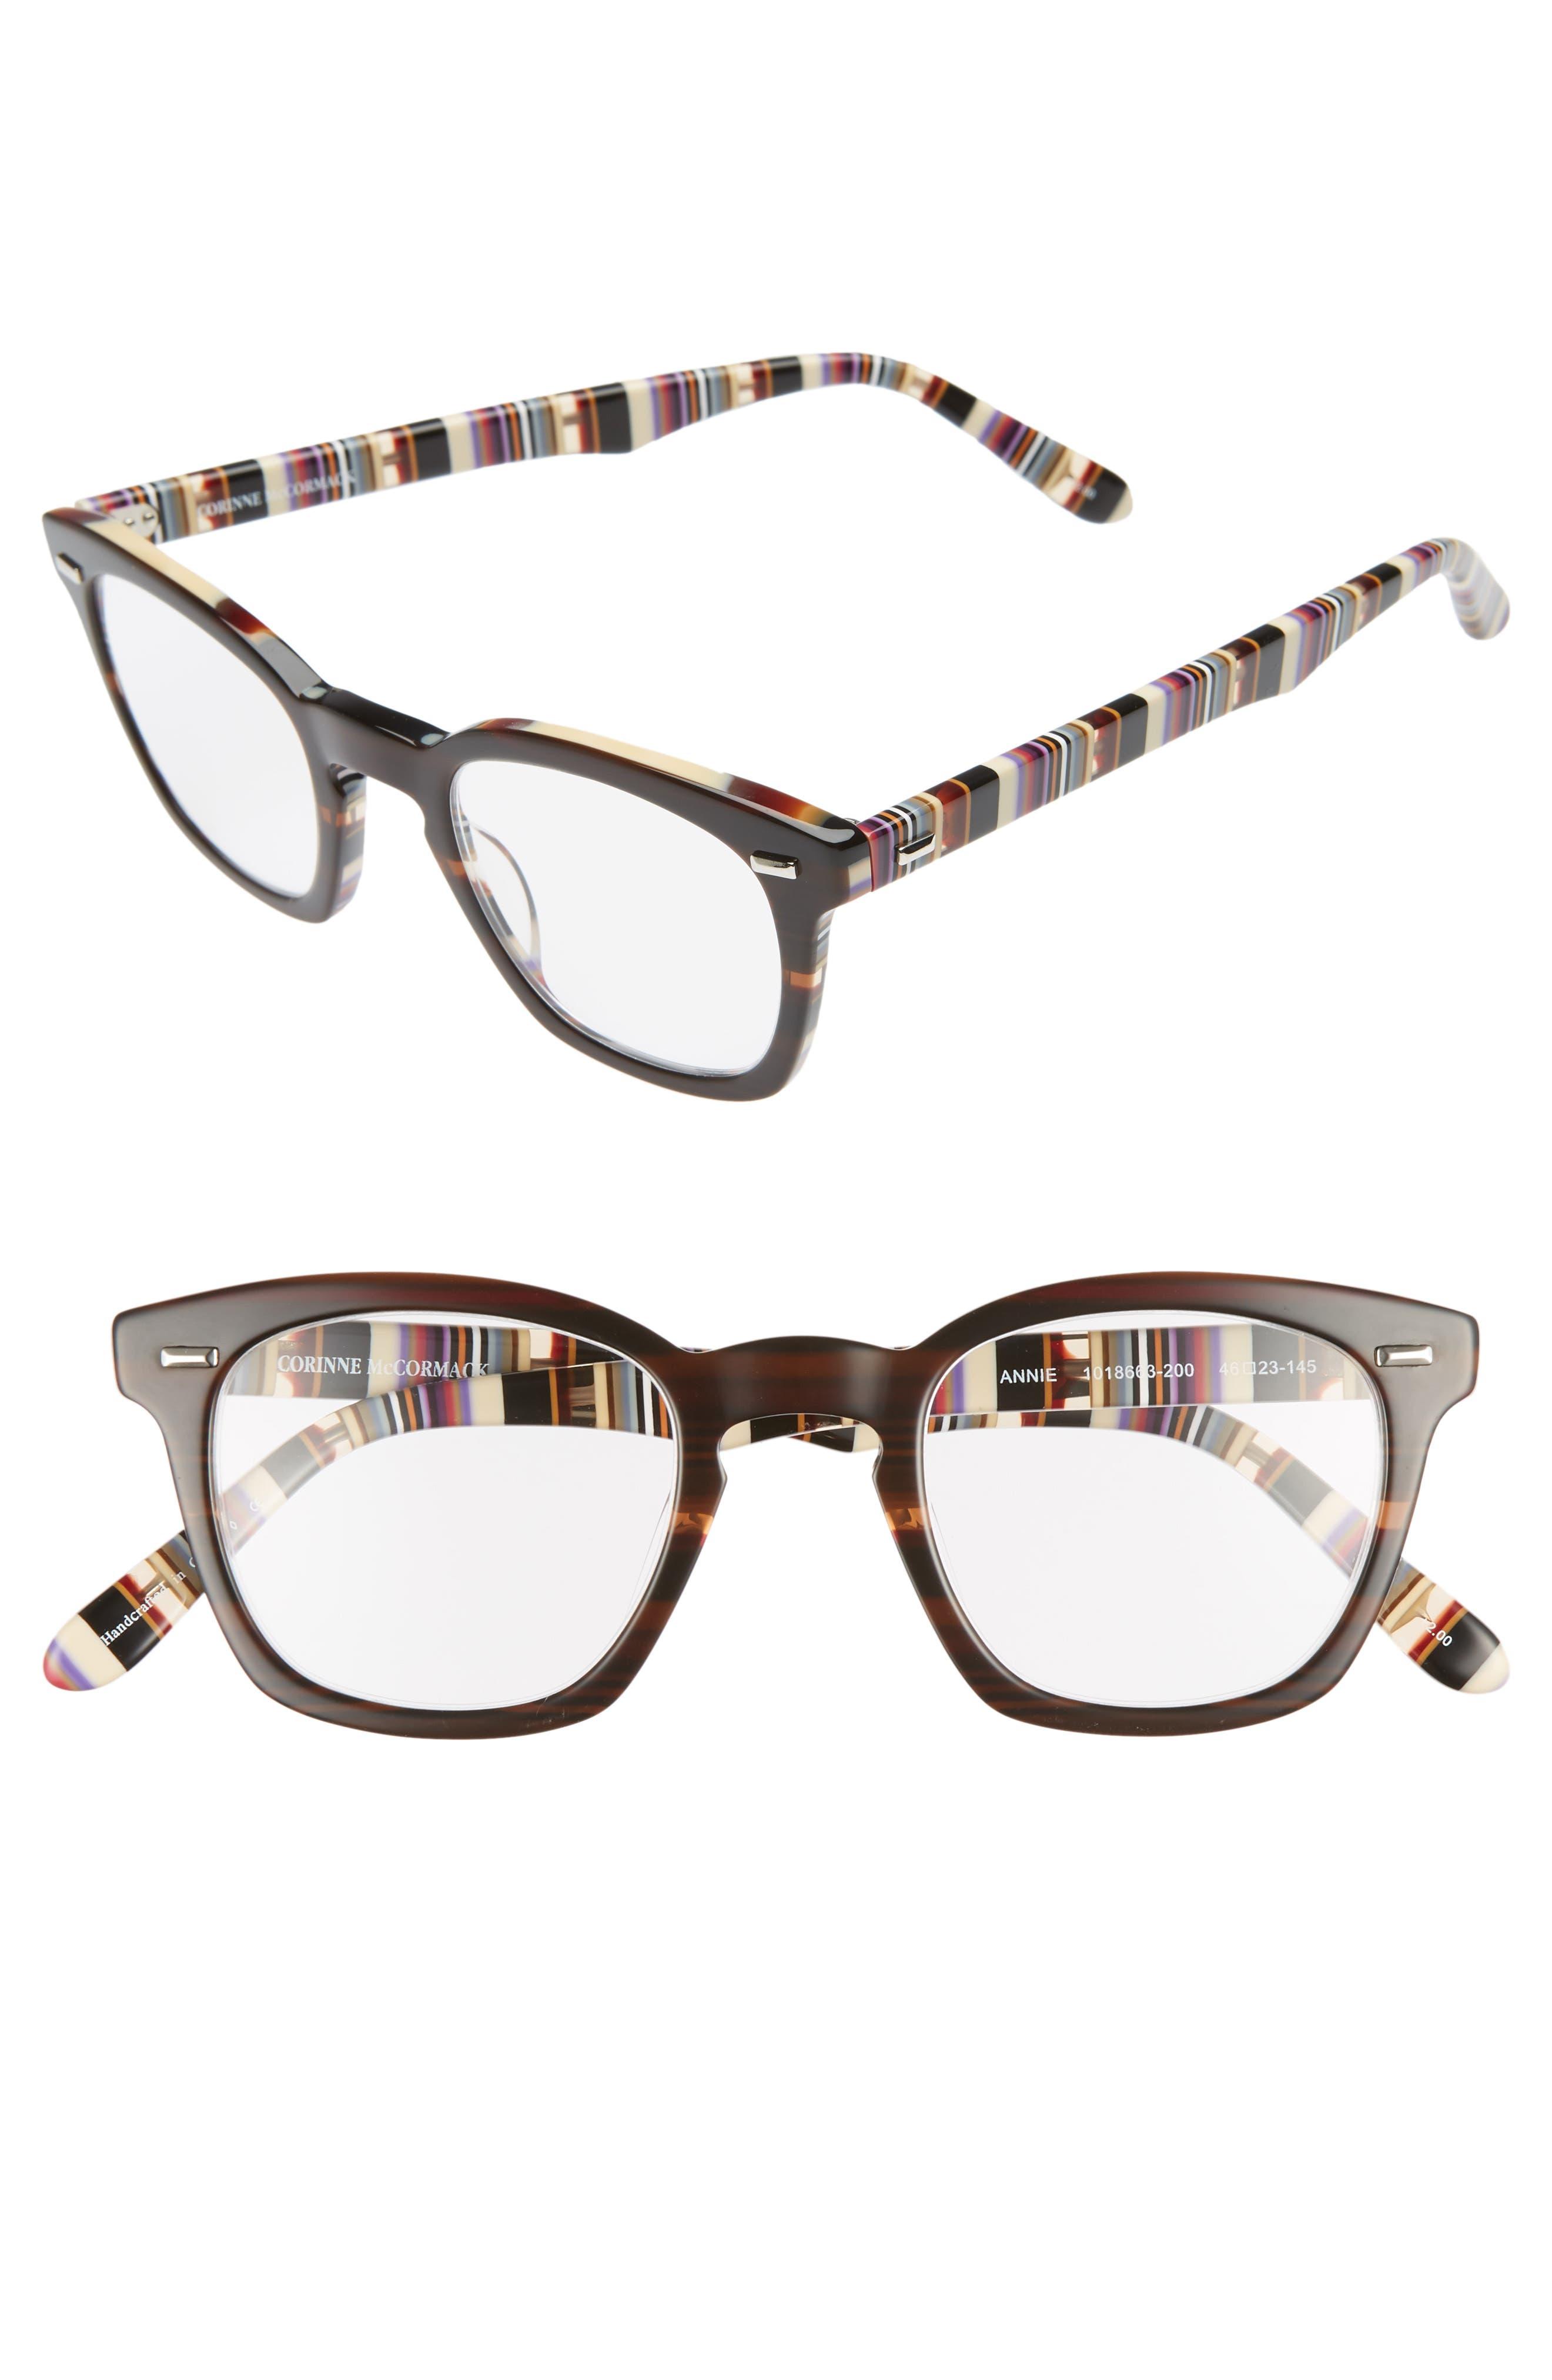 CORINNE MCCORMACK 'Annie' 46mm Reading Glasses, Main, color, BROWN/ STRIPE